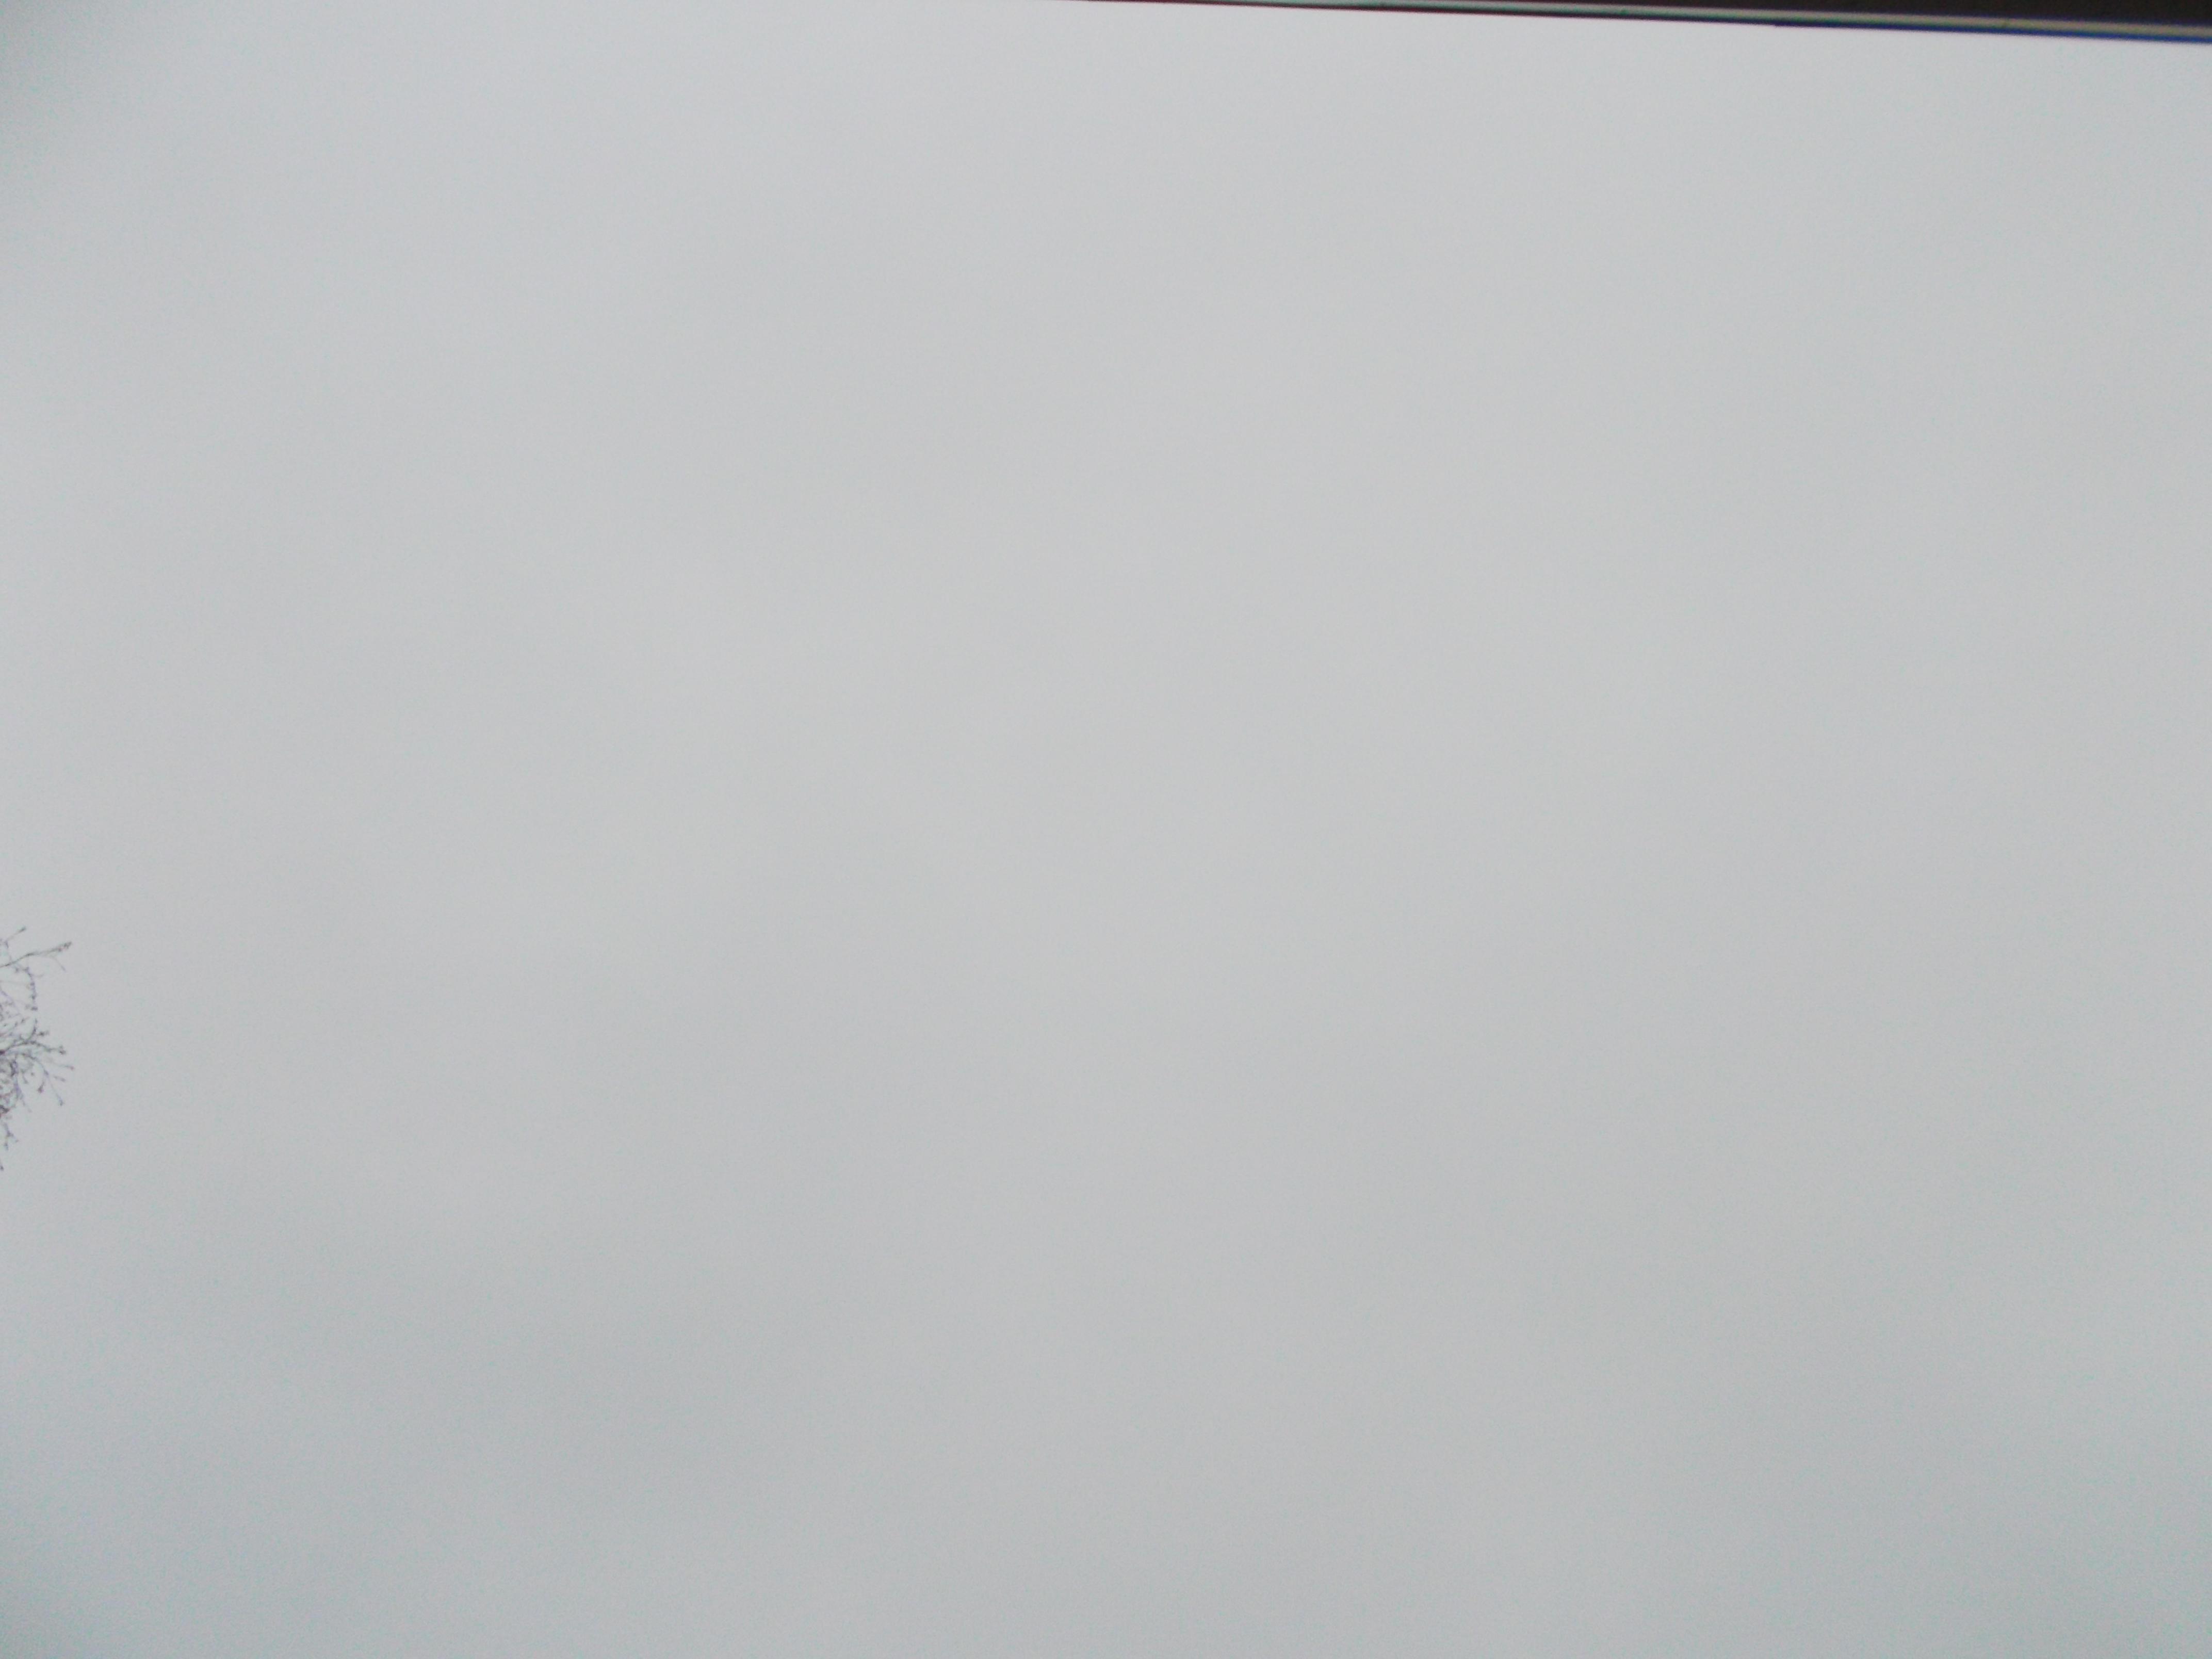 2013-01-05 Longitude -0.371 Latitude 49.182 Altitude 13 Heure 15h02